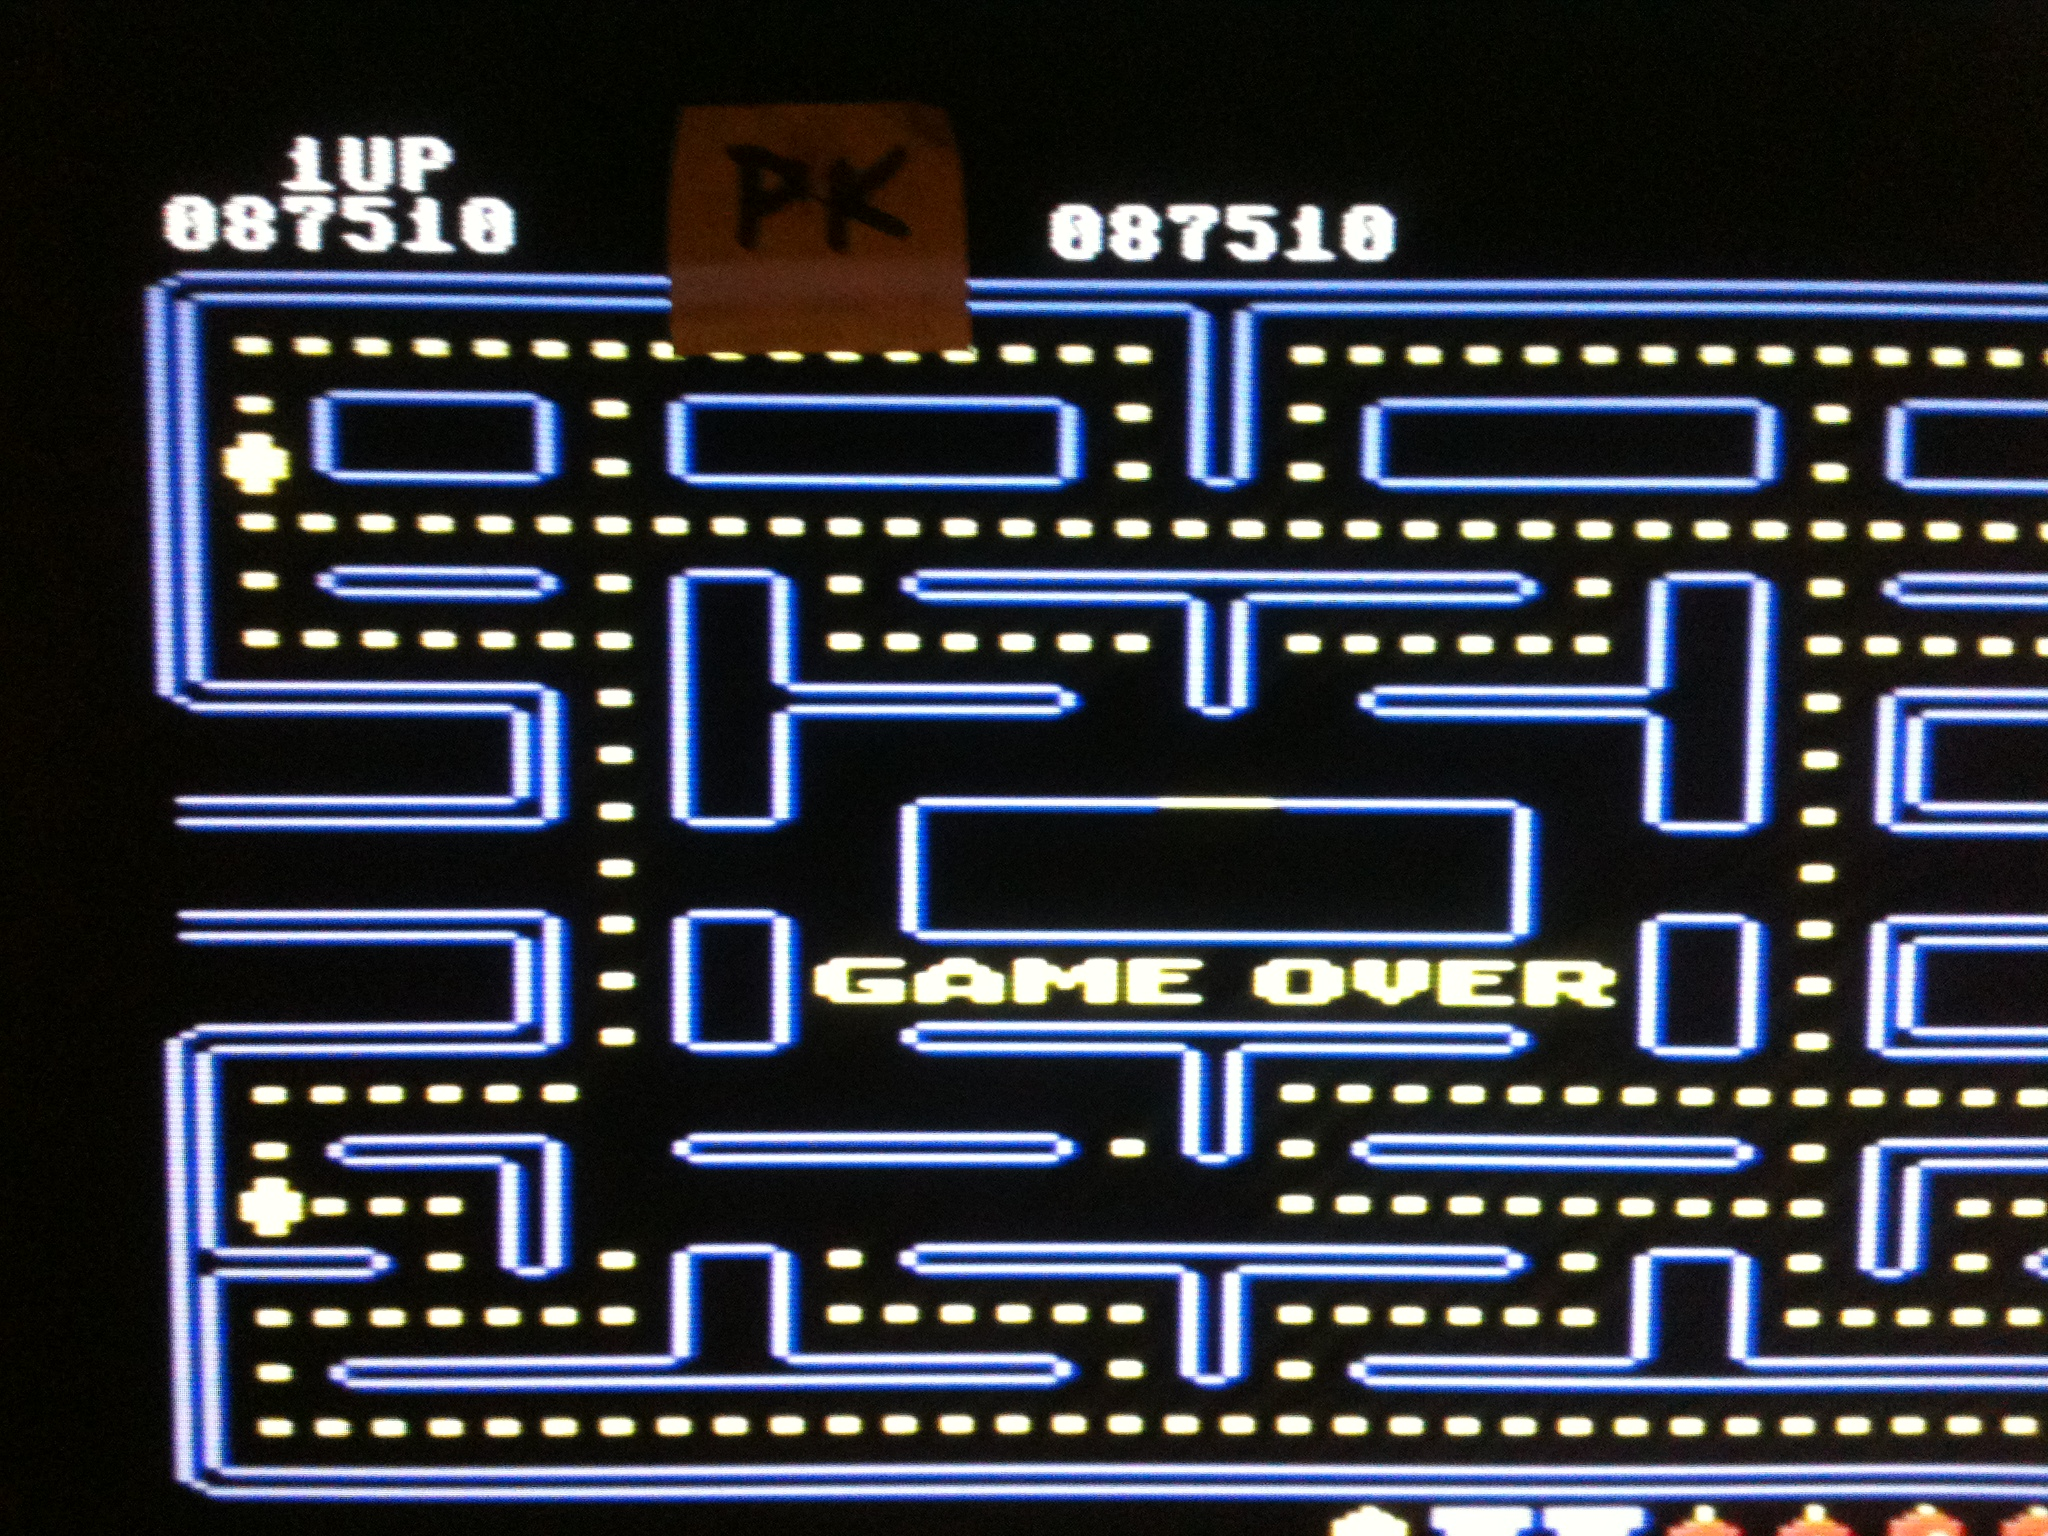 Pac-Man 87,510 points